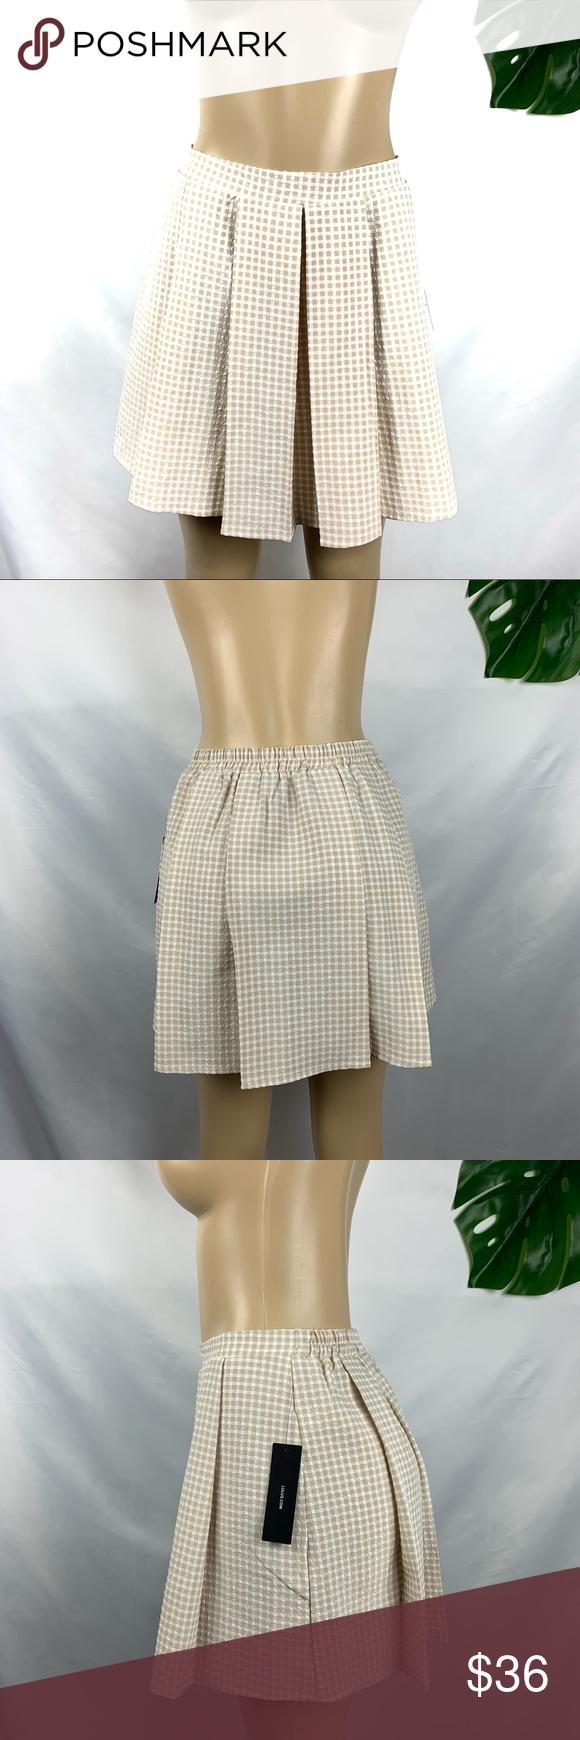 Multi mini skirts size 36 Nwt Lulus Pleated Tan White Multi Plaid Mini Skirt In 2020 Plaid Mini Skirt Mini Skirts Clothes Design